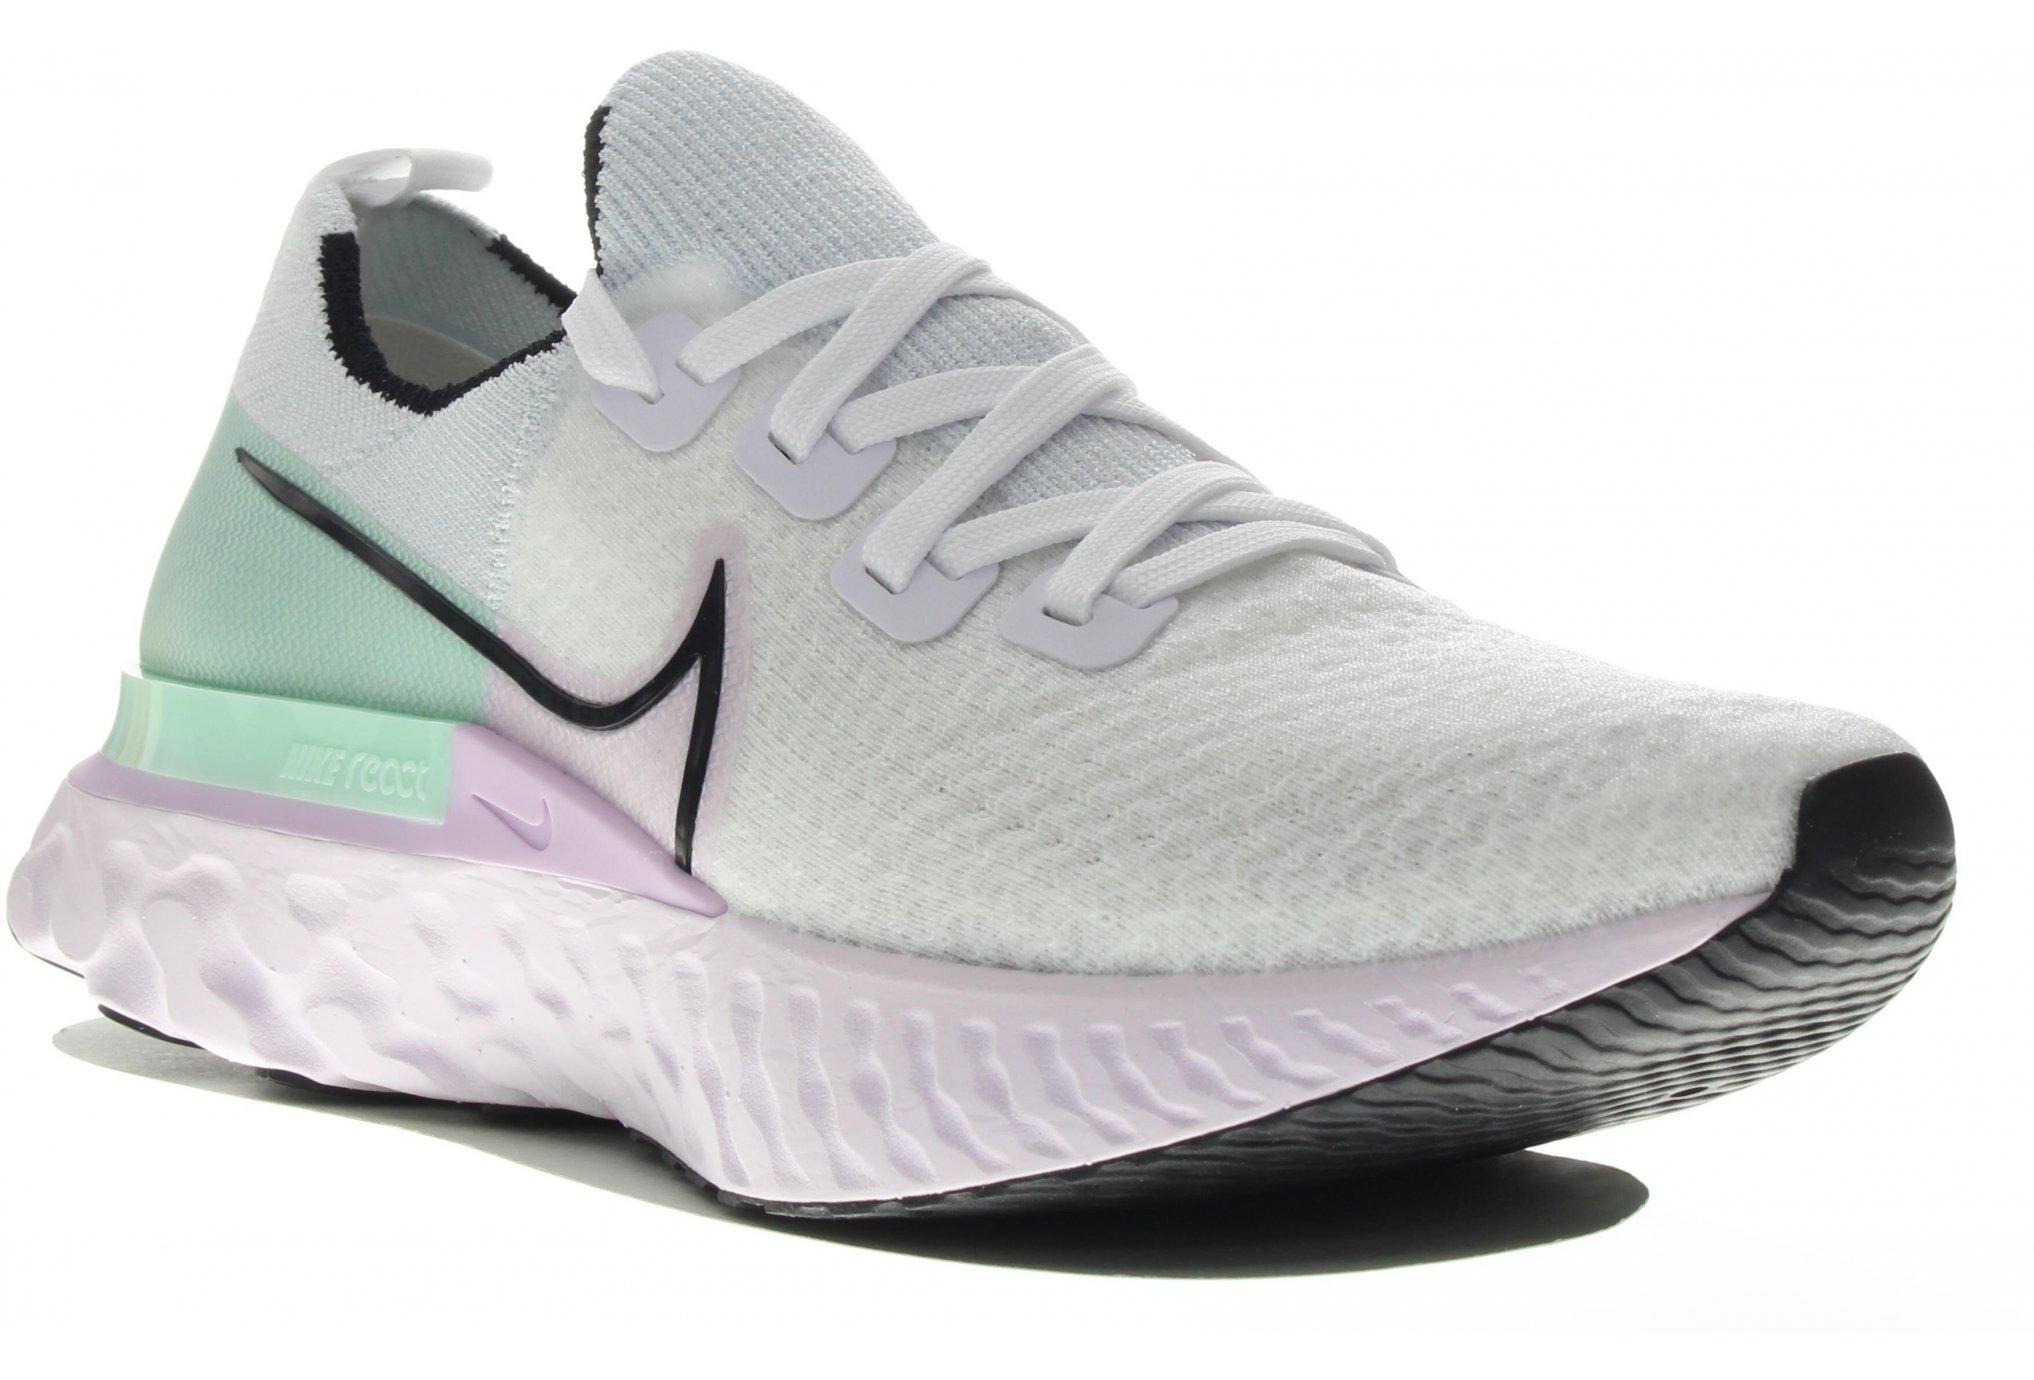 Nike React Infinity Run Flyknit Chaussures running femme